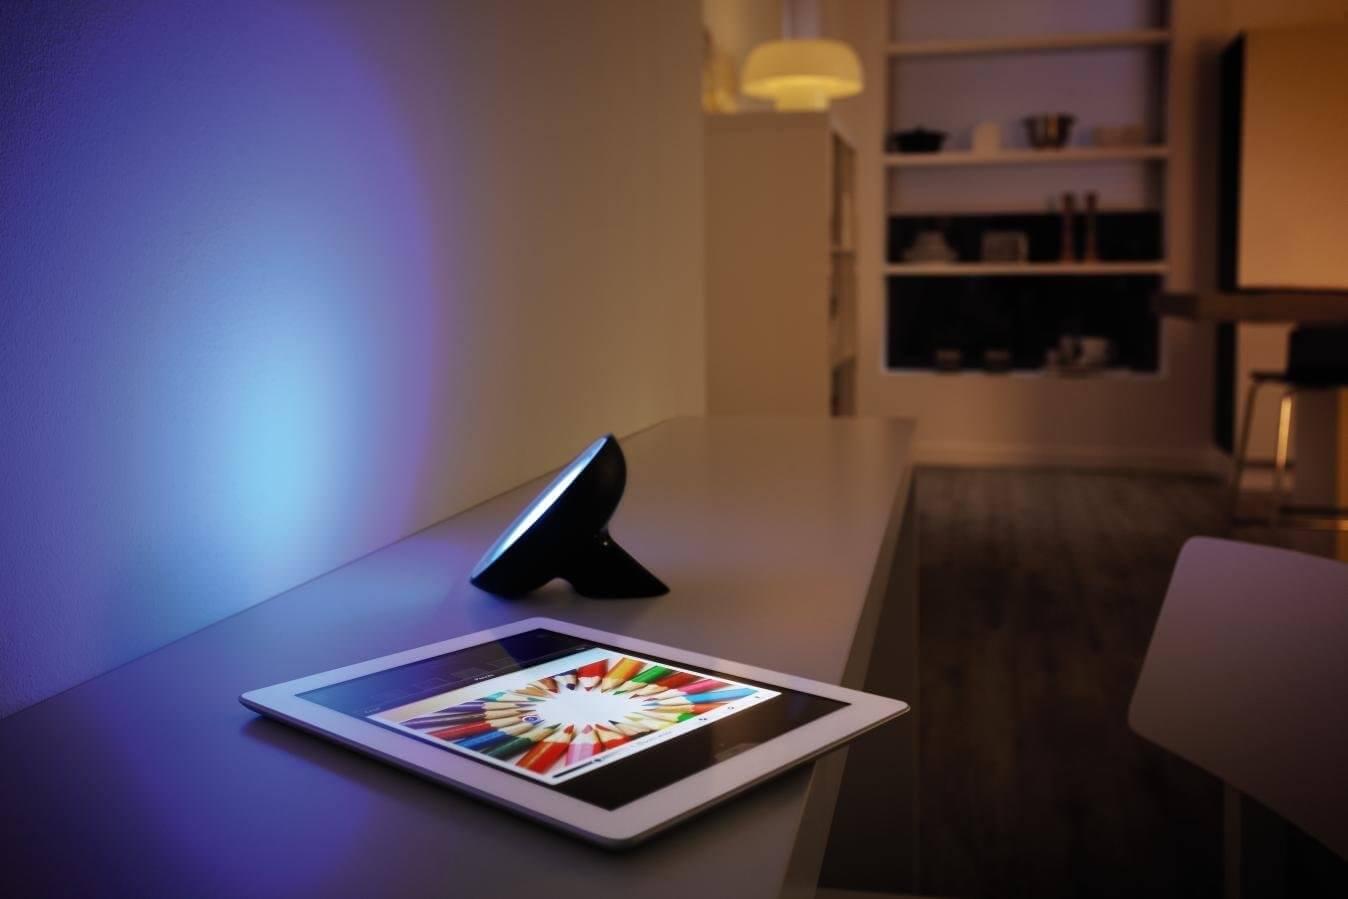 hue bloom smart lighting ideas